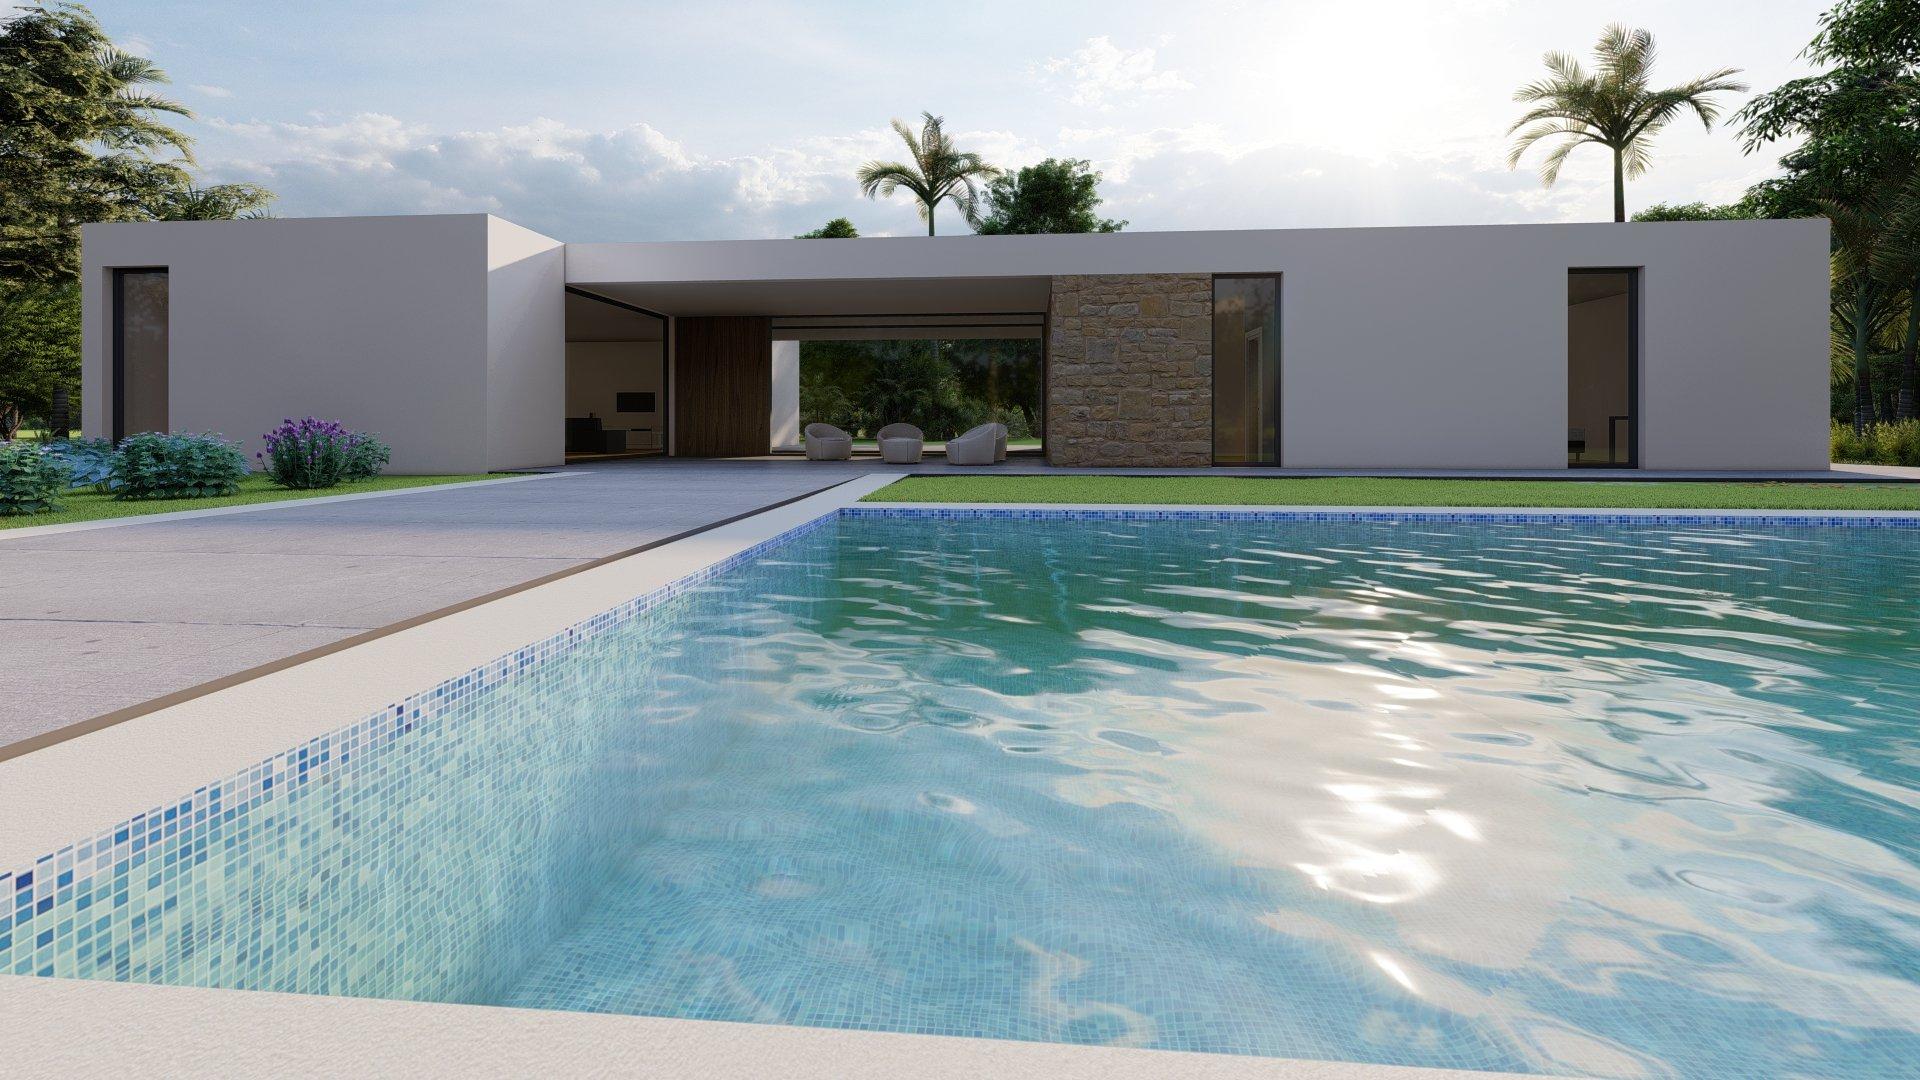 Casa_saludable_modelo_Moraira 5